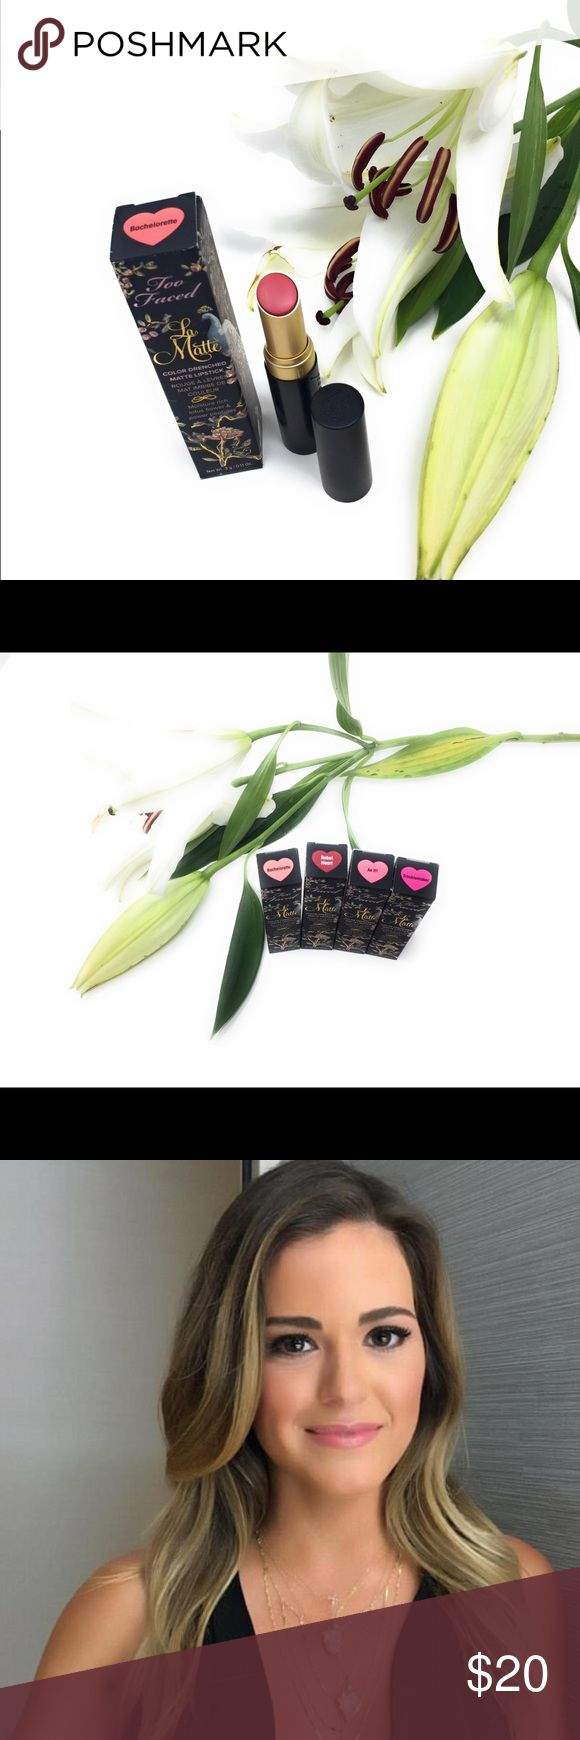 La Matte Lipstick 💄 Color Drenched Matte Lipstick  Moisture rich lotus 🌸 Flower & powder peptides Made it n Canada 🇨🇦 Too Faced Makeup Lipstick